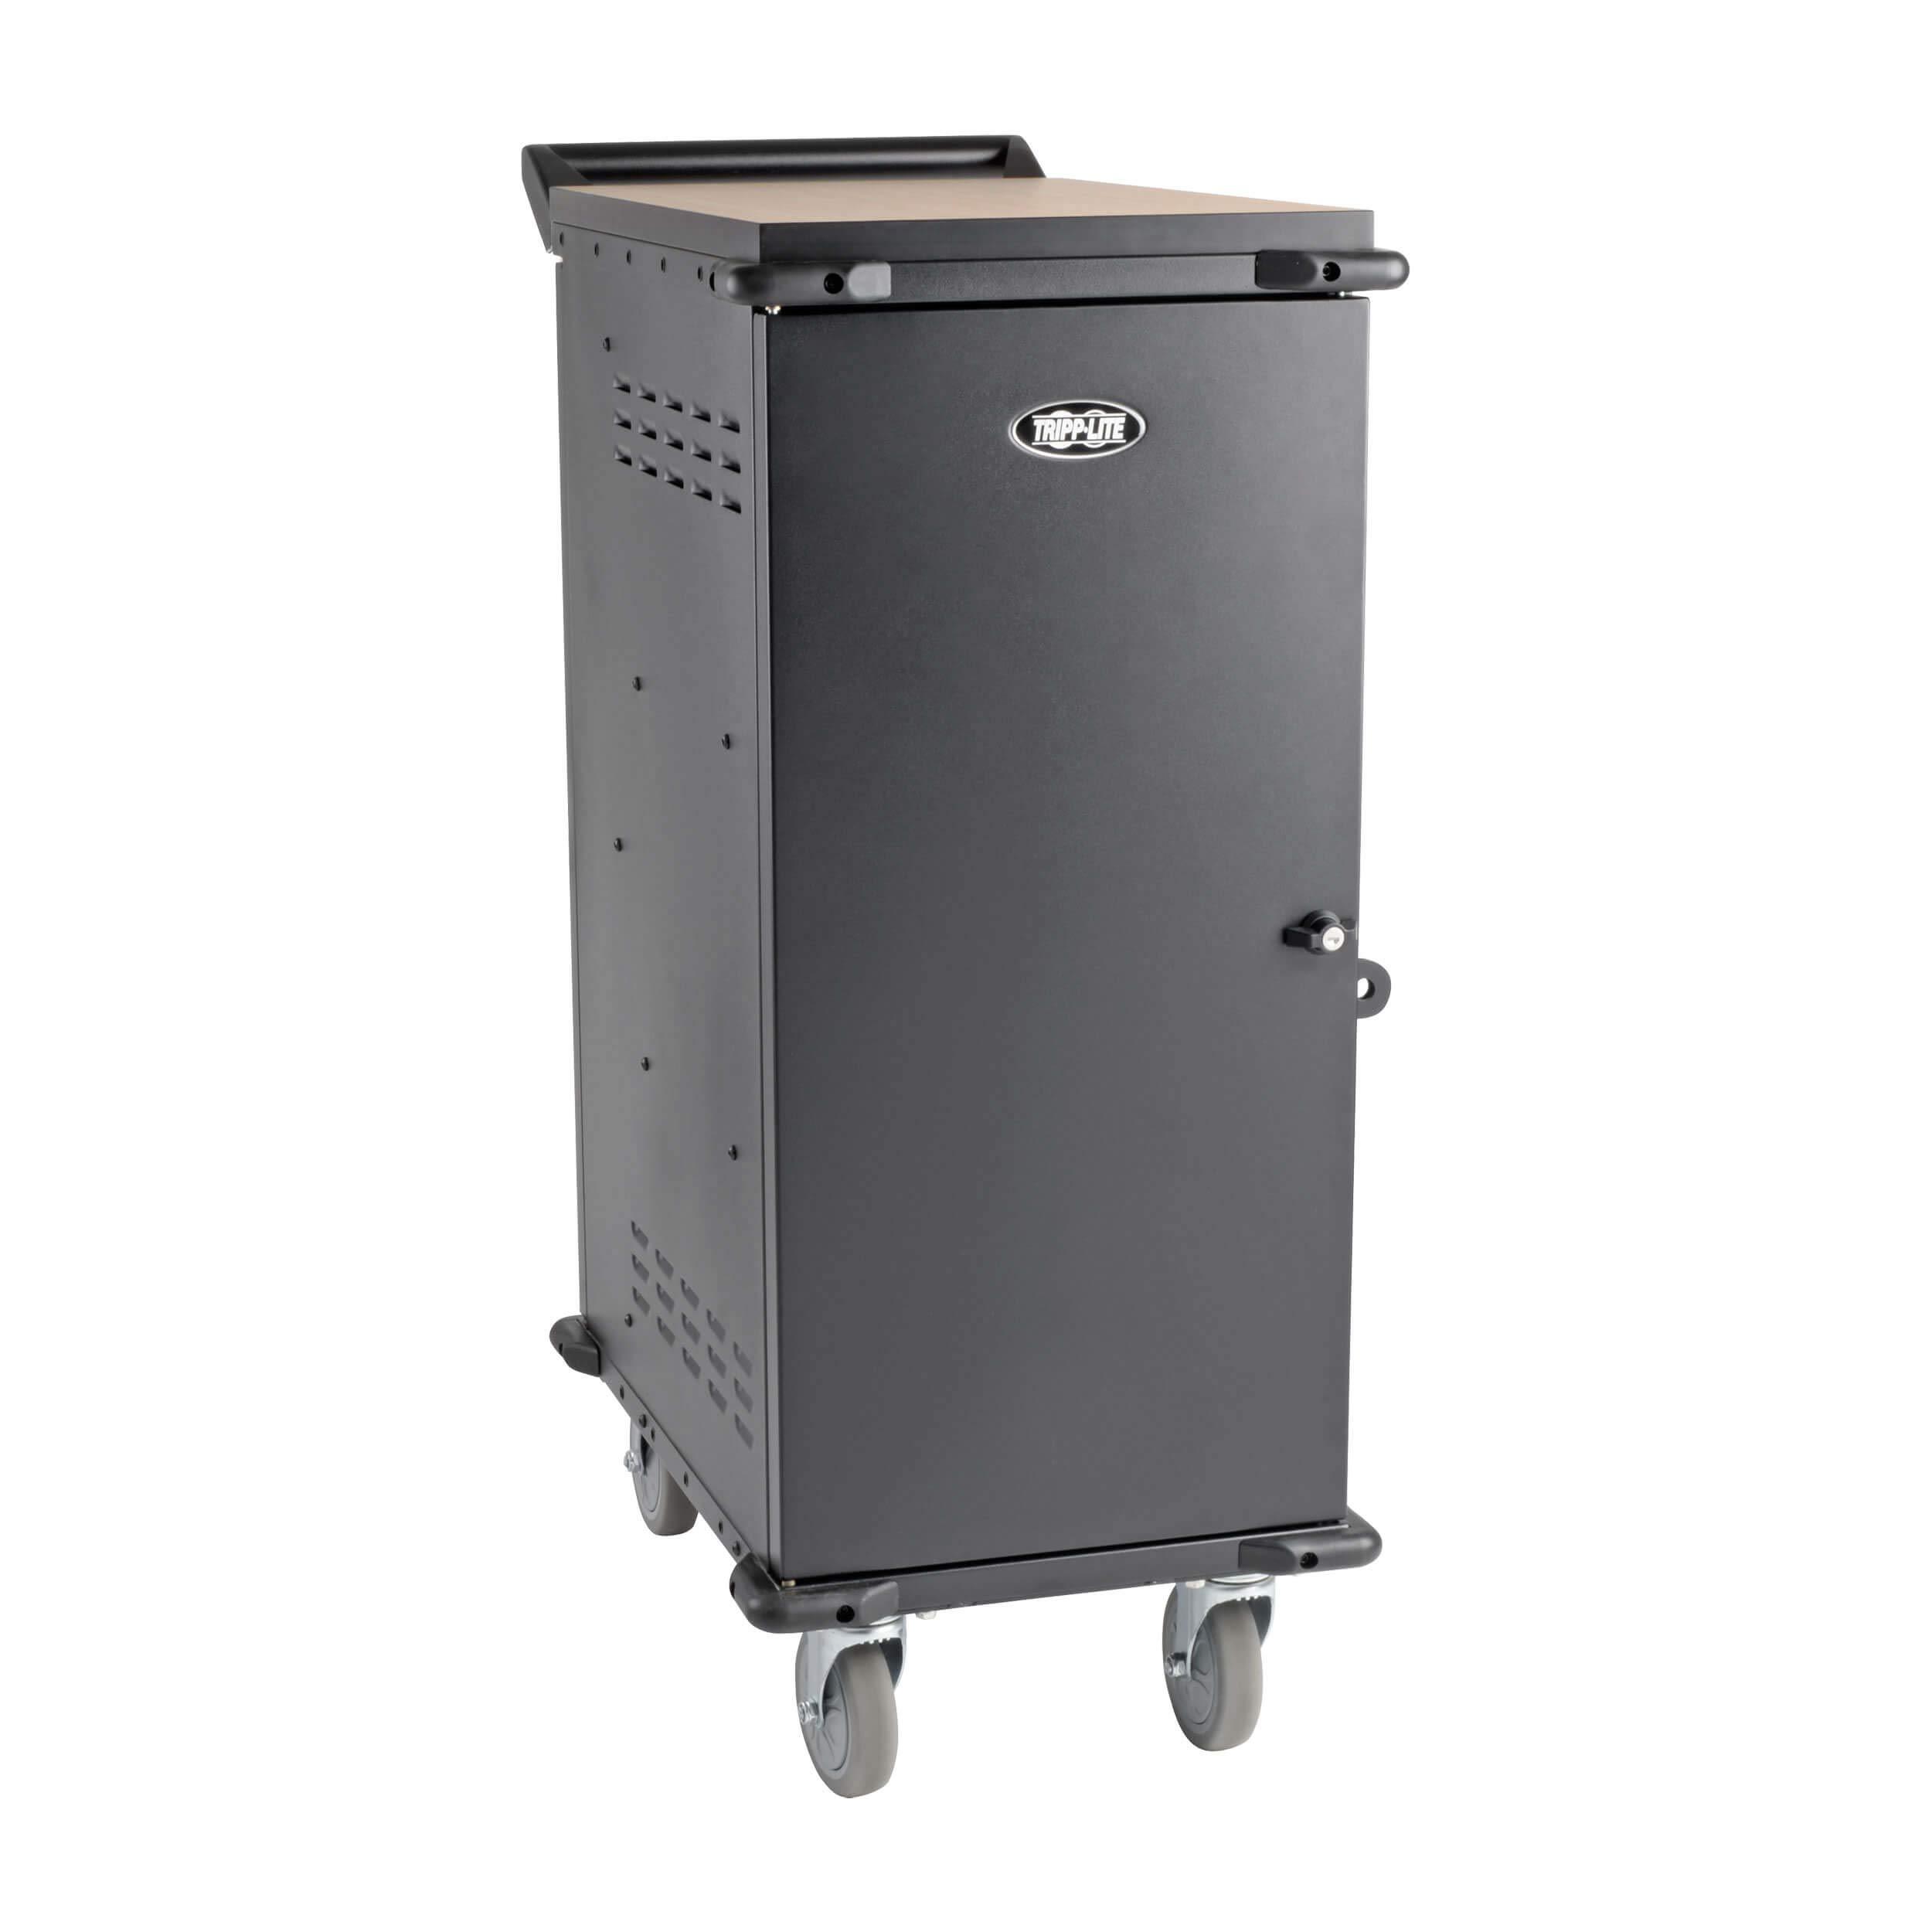 Tripp Lite 21-Port AC Mobile Charging Cart Storage Station for Chromebooks, iPads, Laptops, Tablets, Black (CSC21AC)